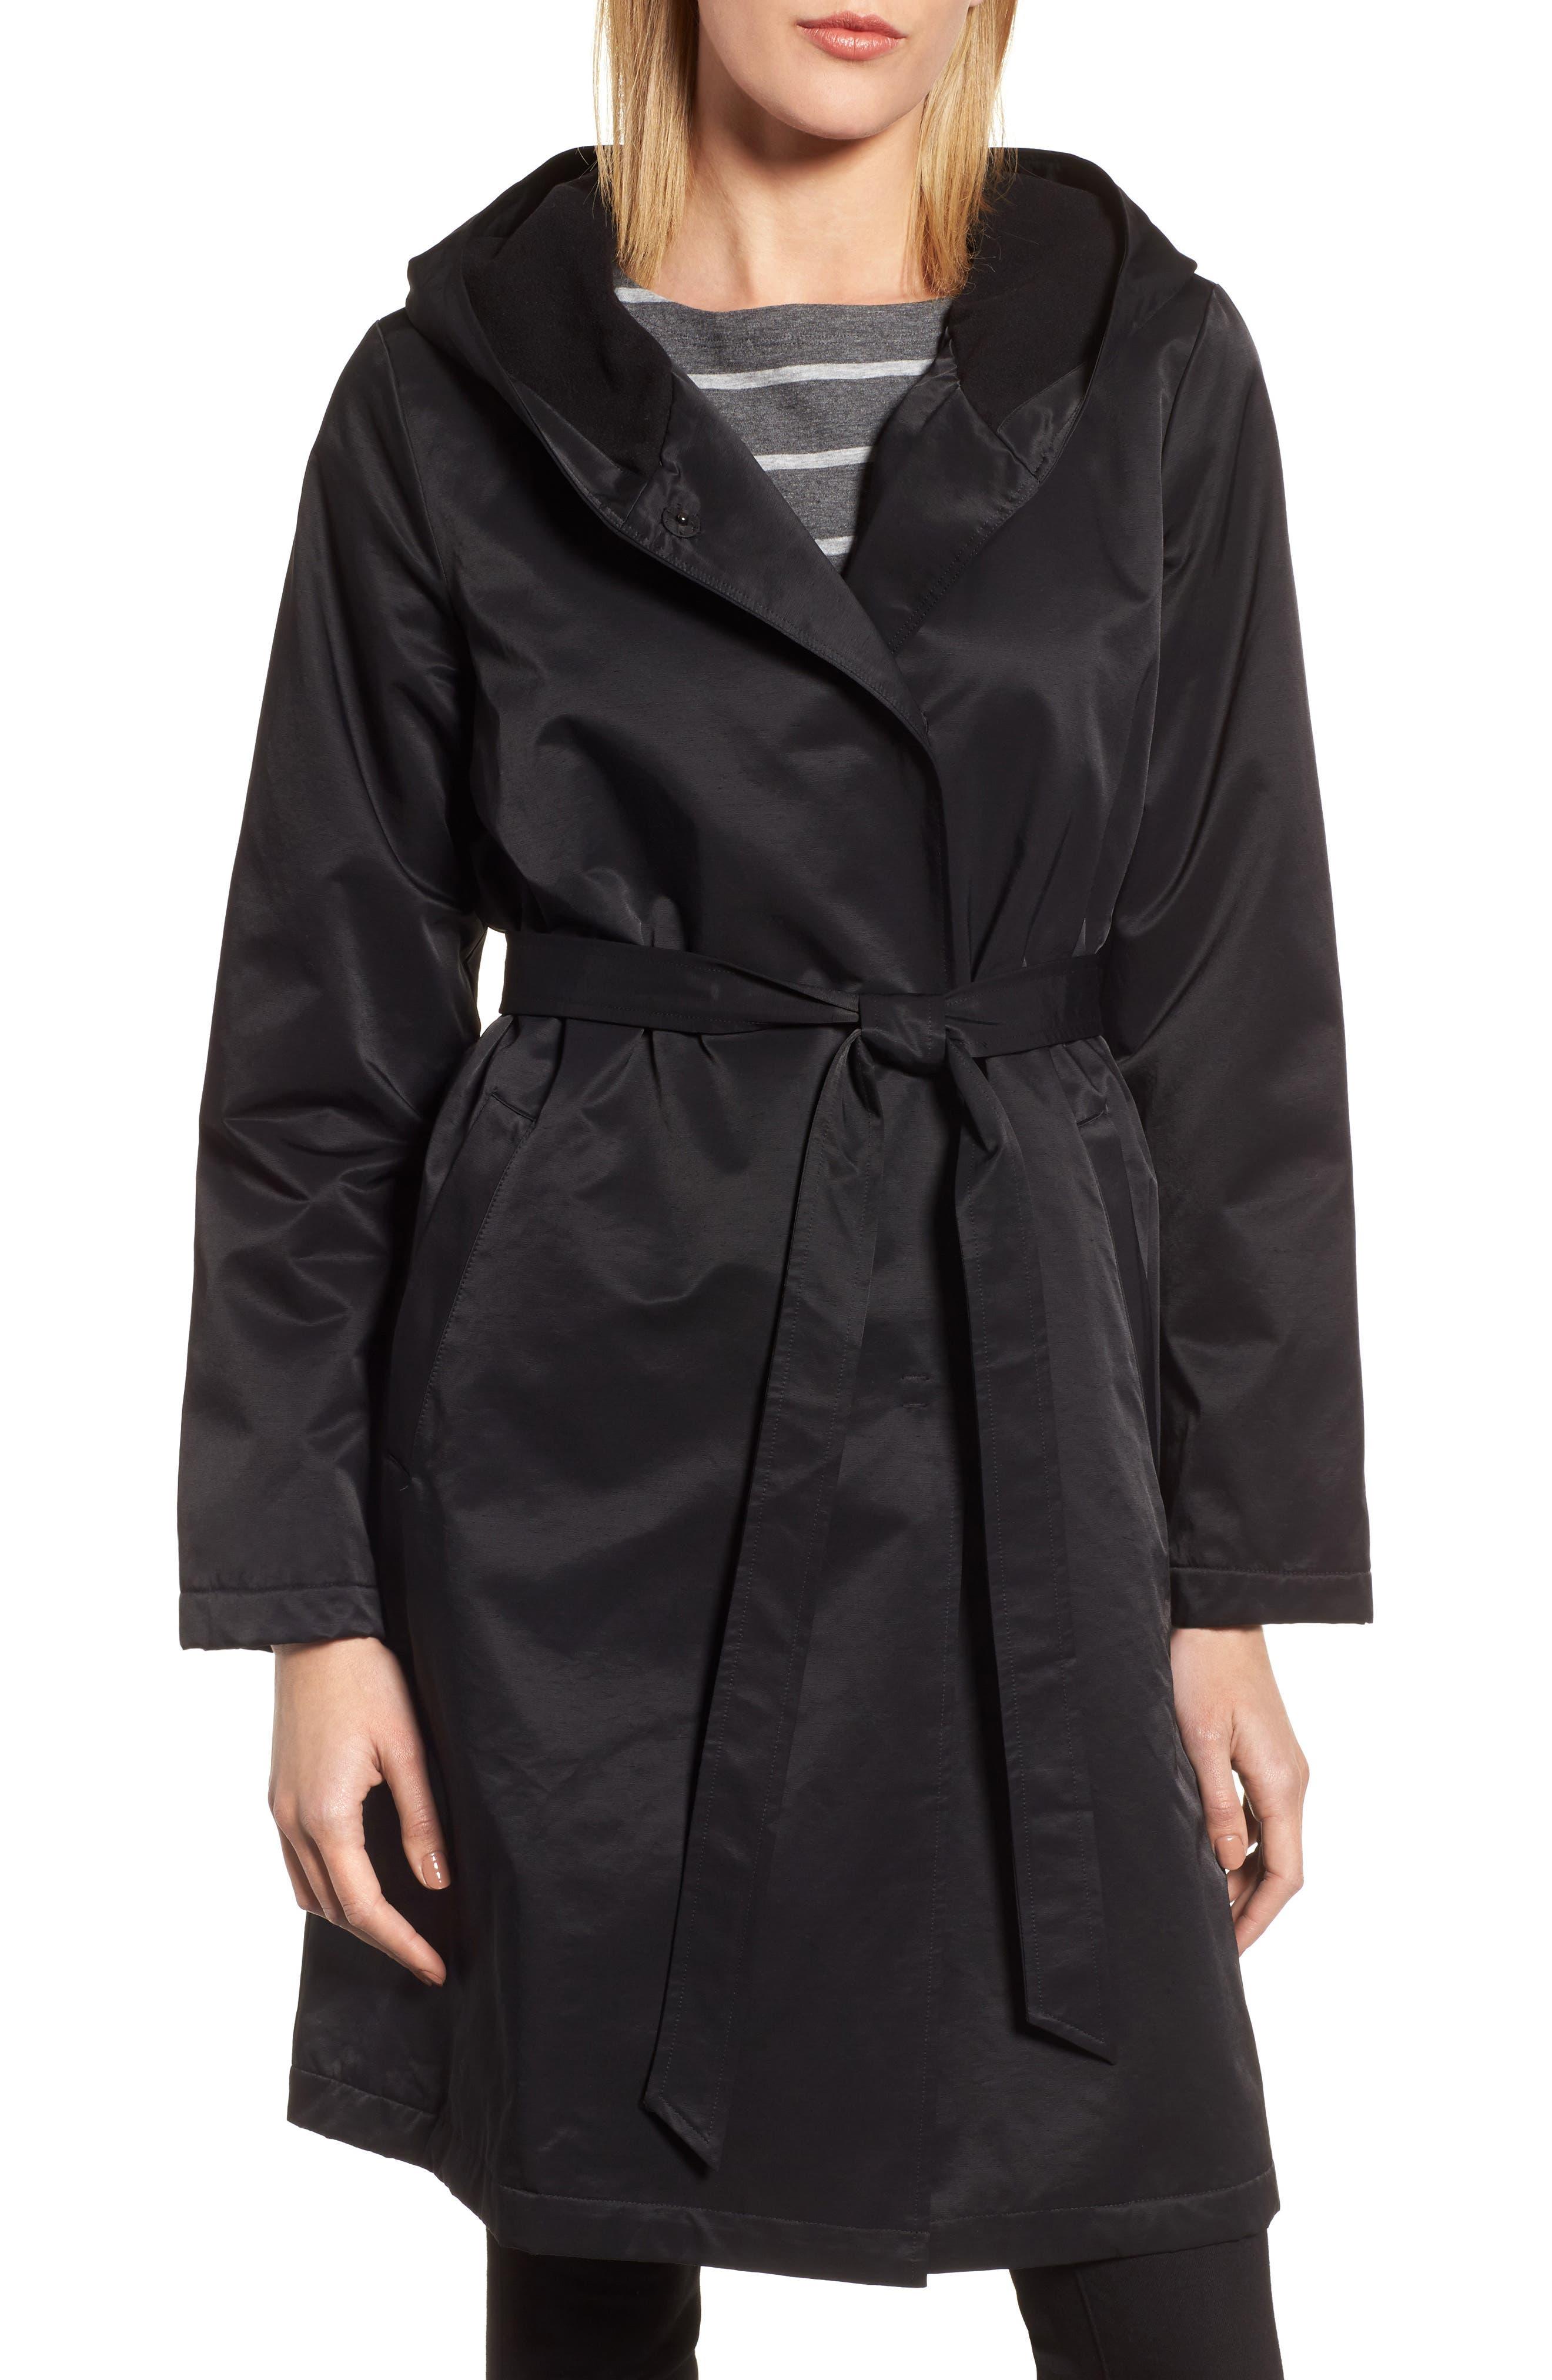 Alternate Image 1 Selected - Eileen Fisher Fleece Lined Hooded Coat